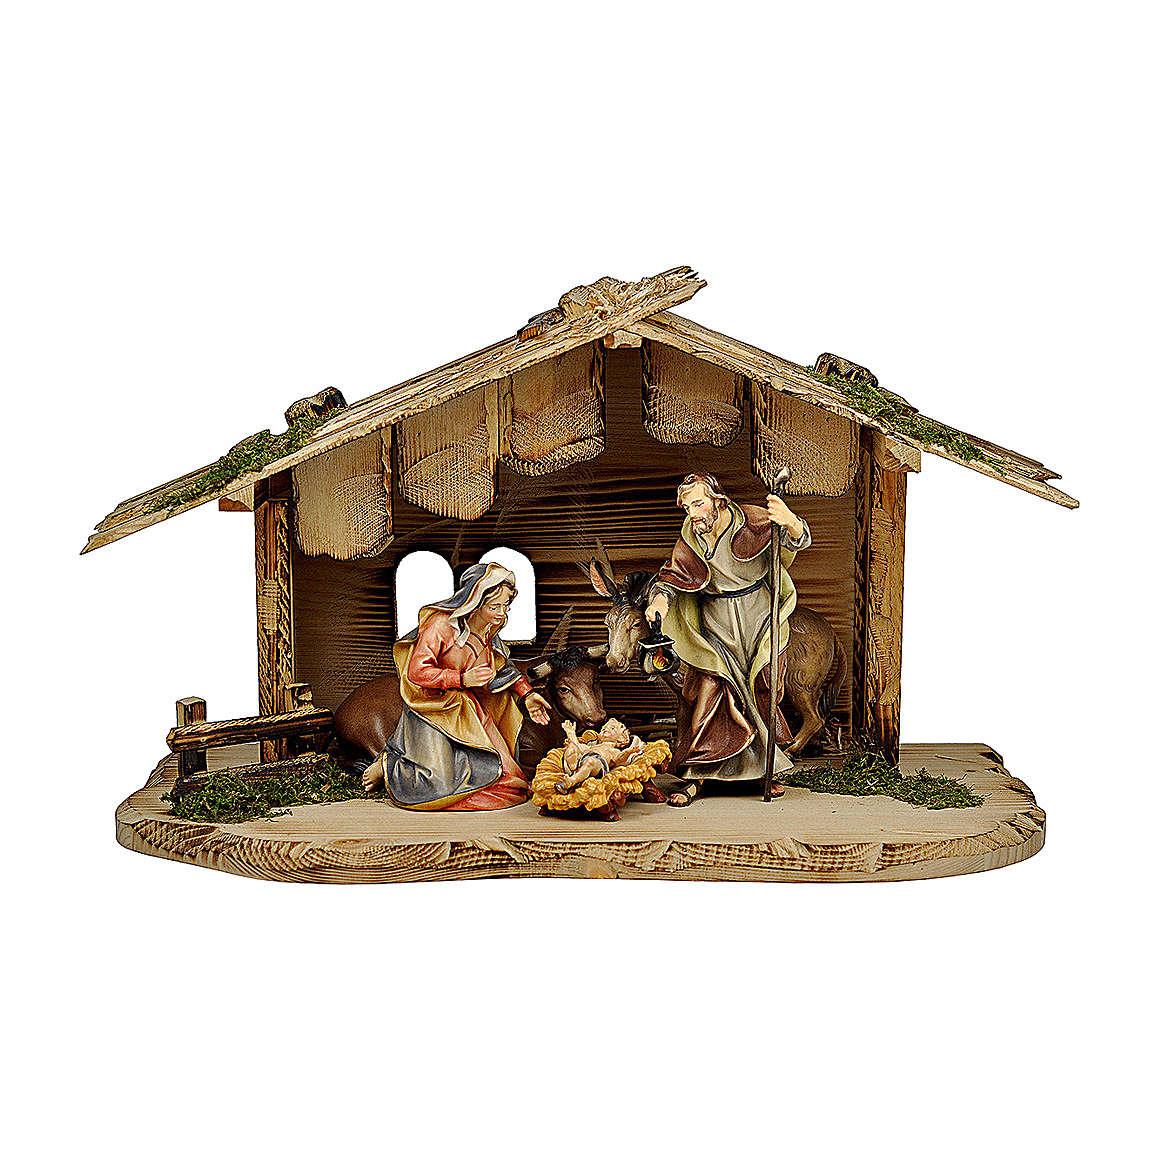 Sacra famiglia con bue e asino presepe Original legno dipinto in Valgardena 10 cm 5 pz 4